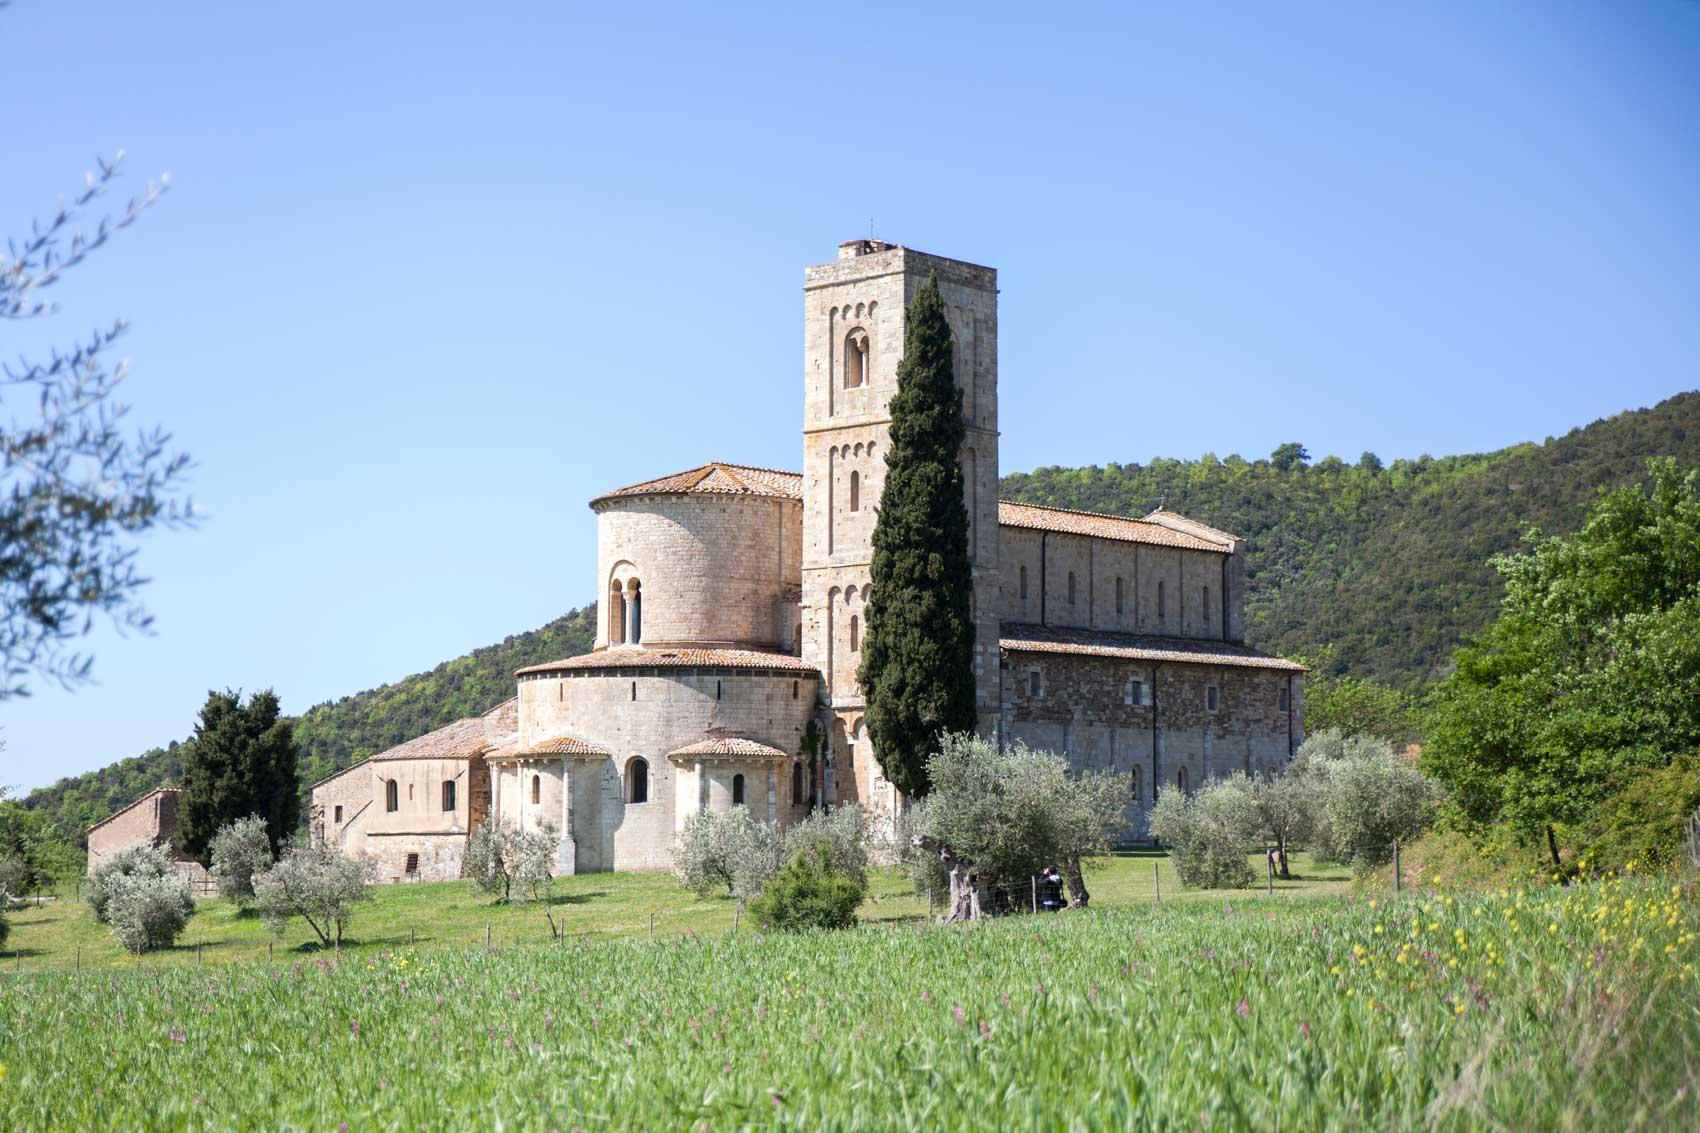 Toscana_claraBmartin_6